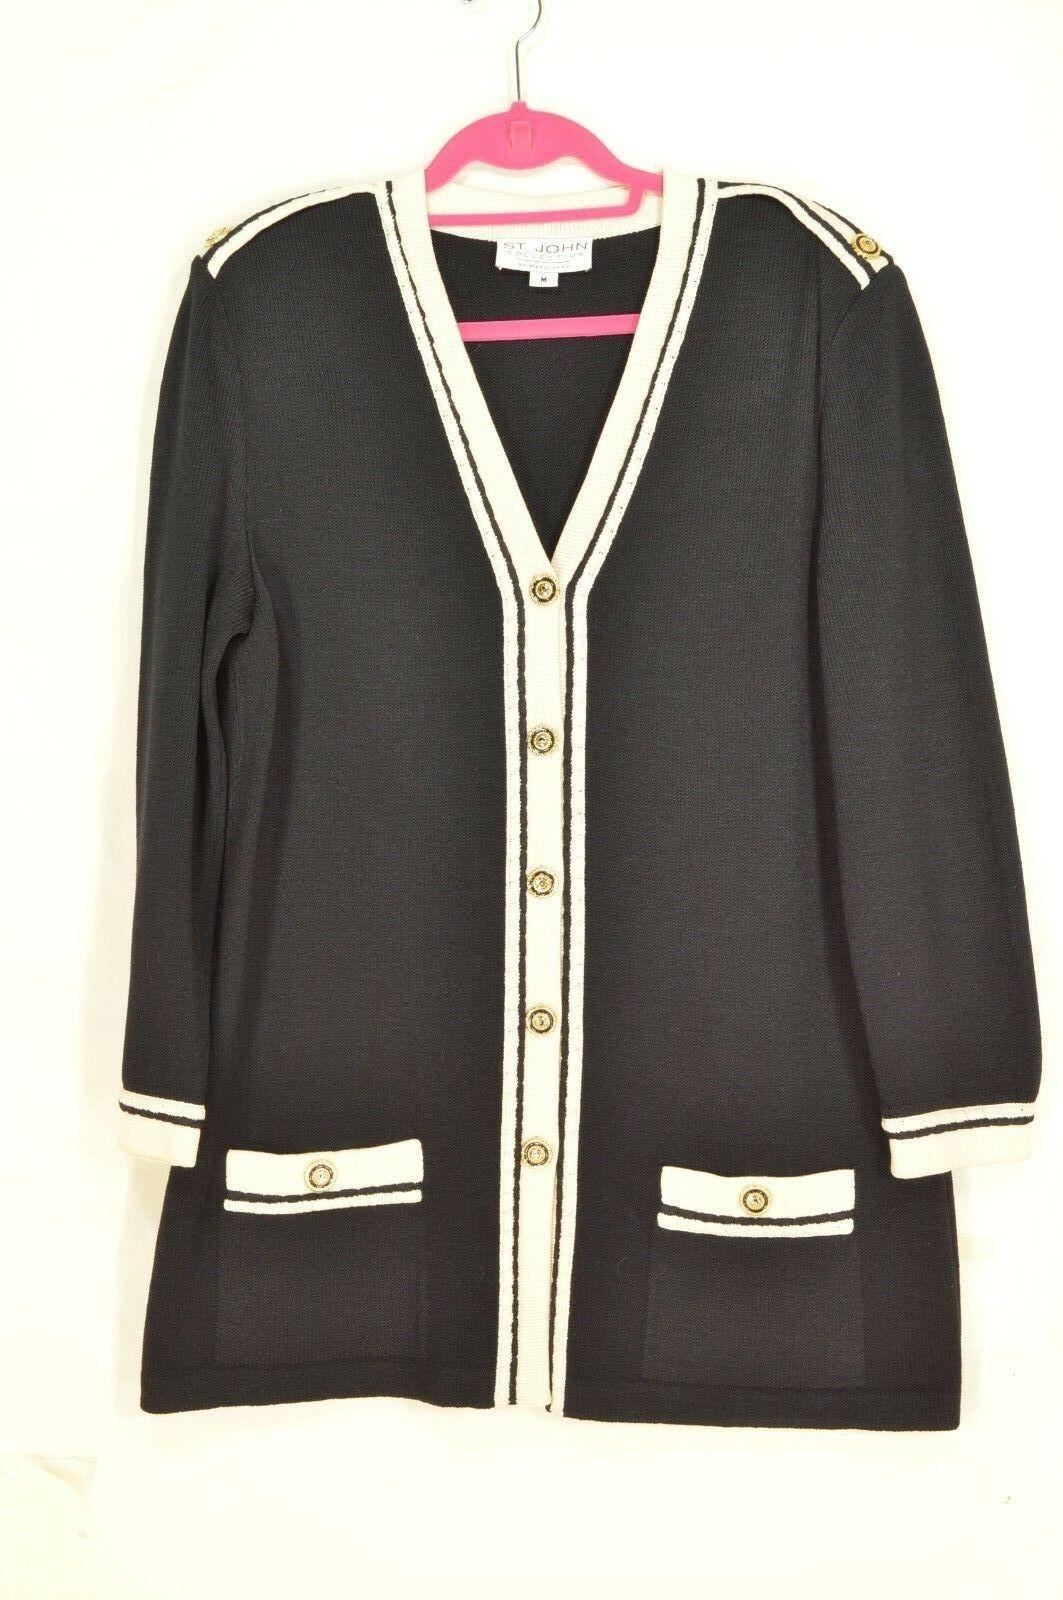 St John Marie Gray jacket blazer M santana knit black cream trim epaulettes USA